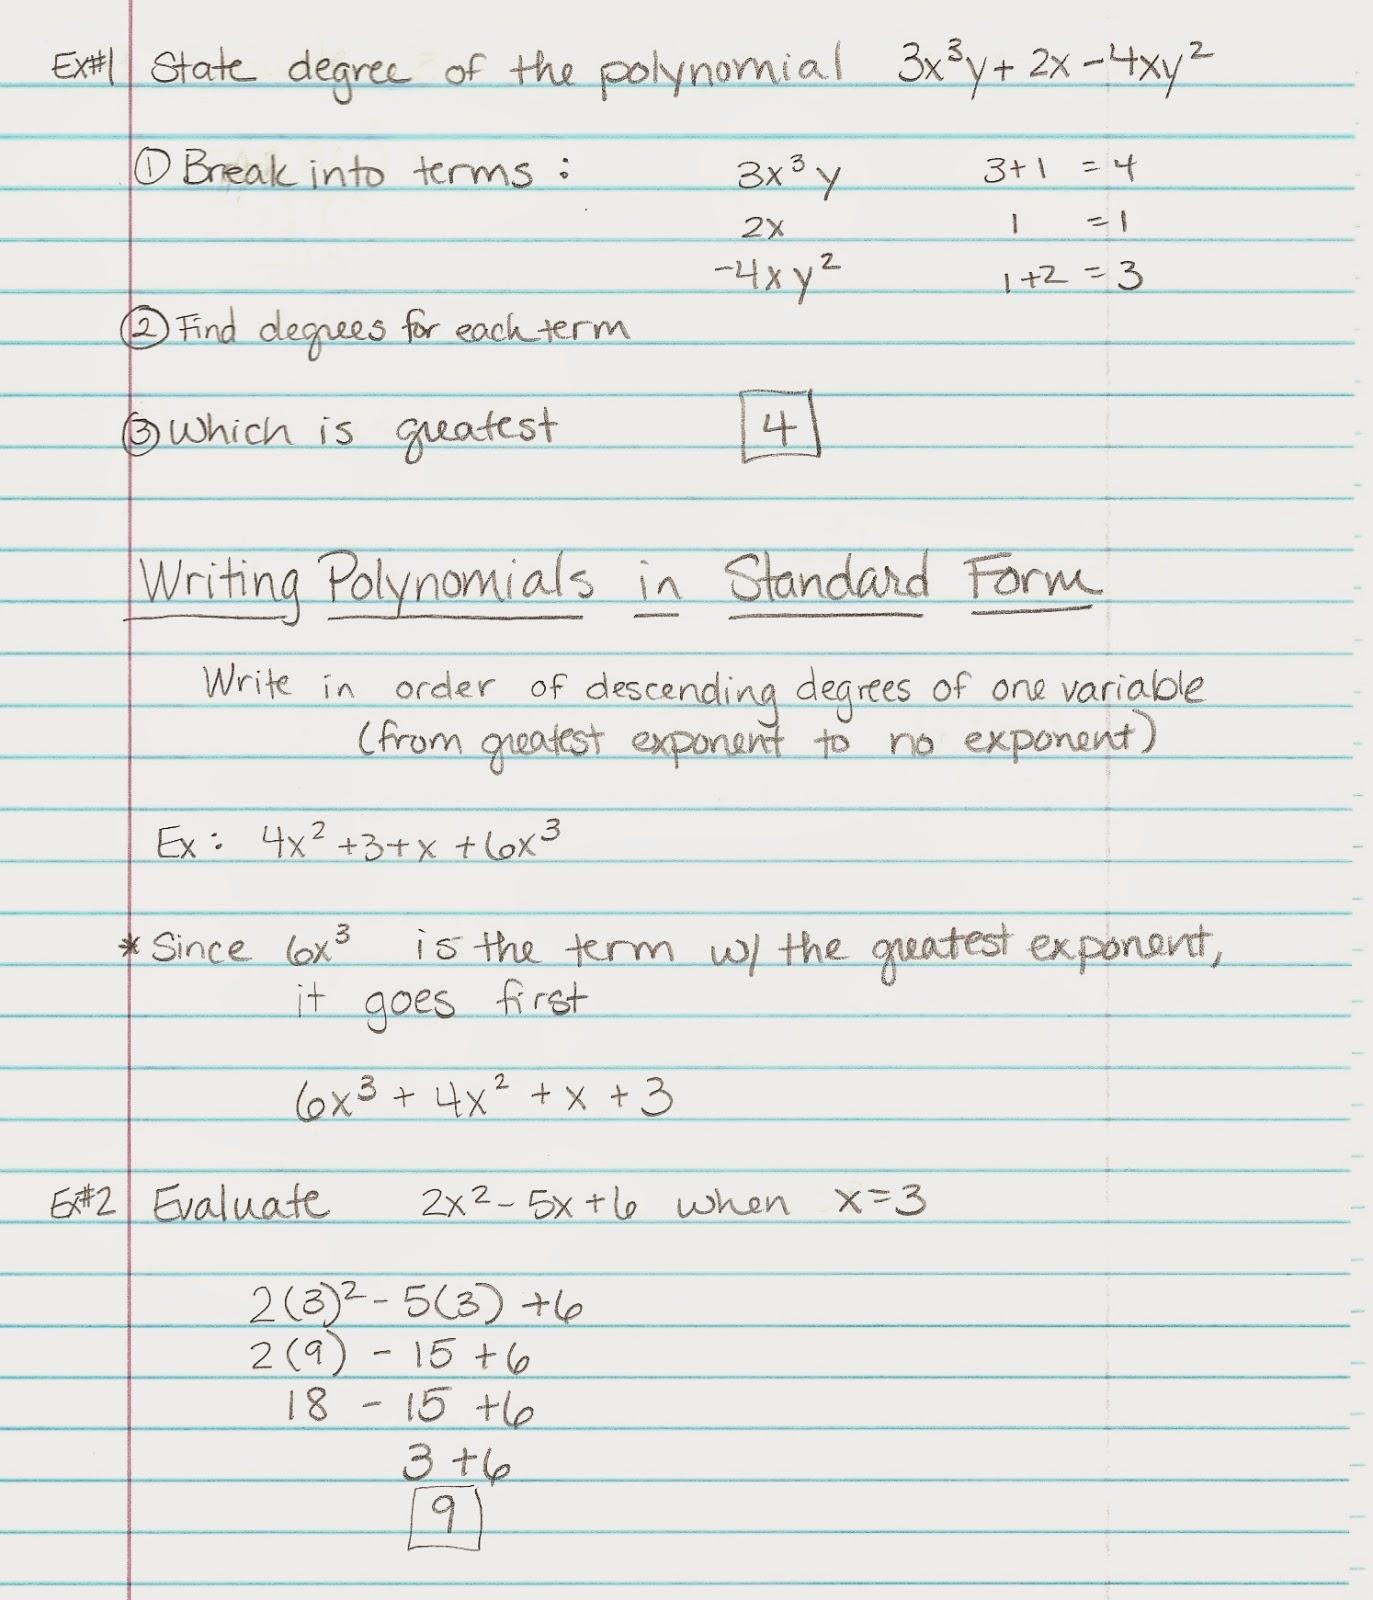 Homework Notes Homework Notes To Parents 02 11